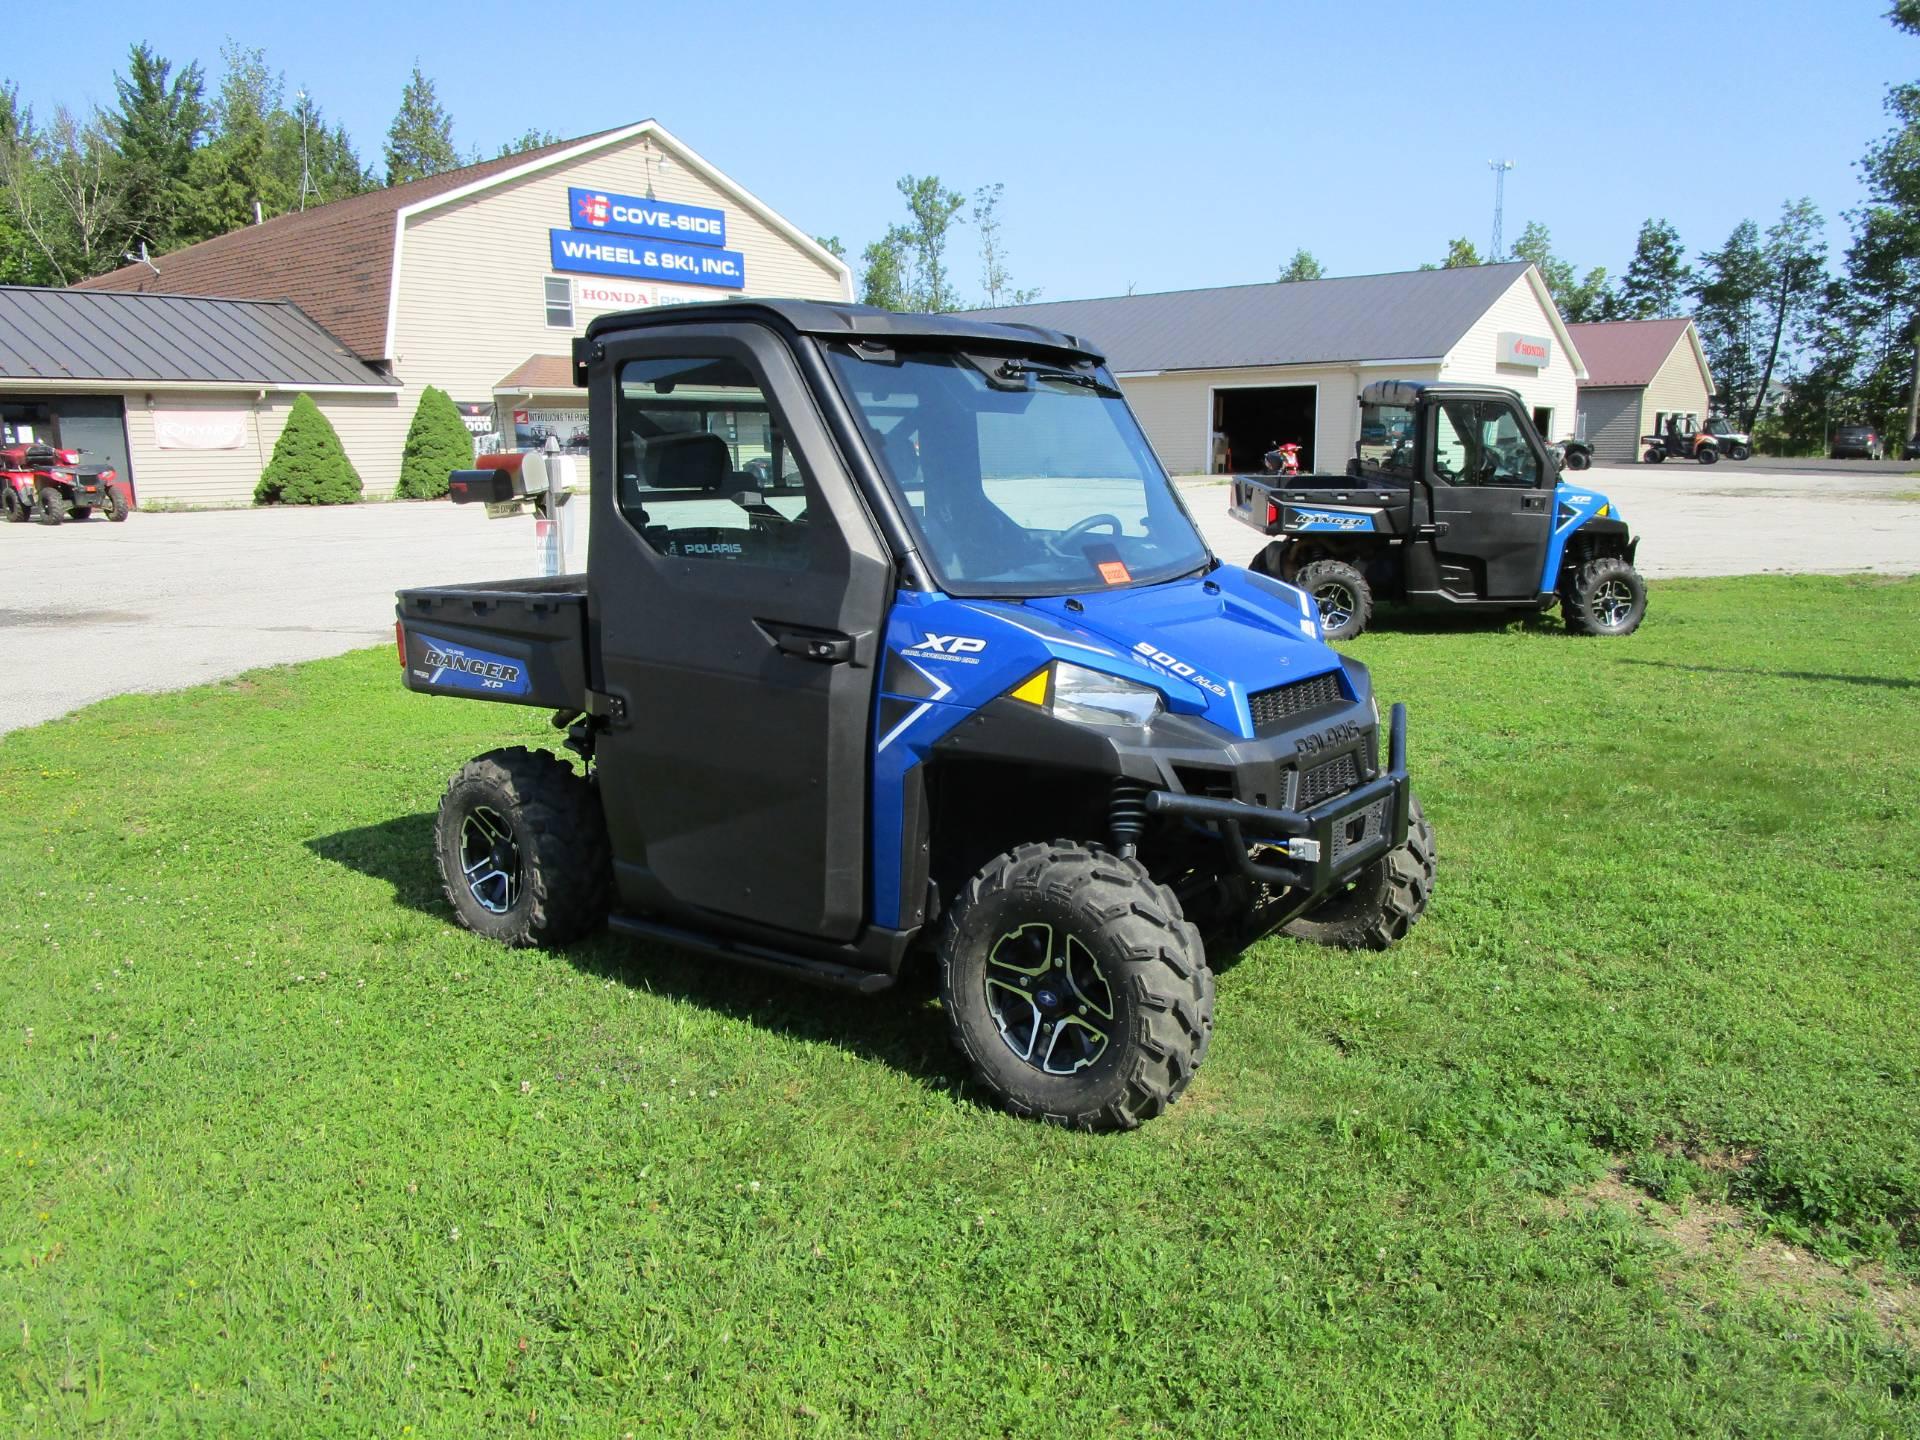 Used 2018 Polaris Ranger XP 900 EPS Utility Vehicles in